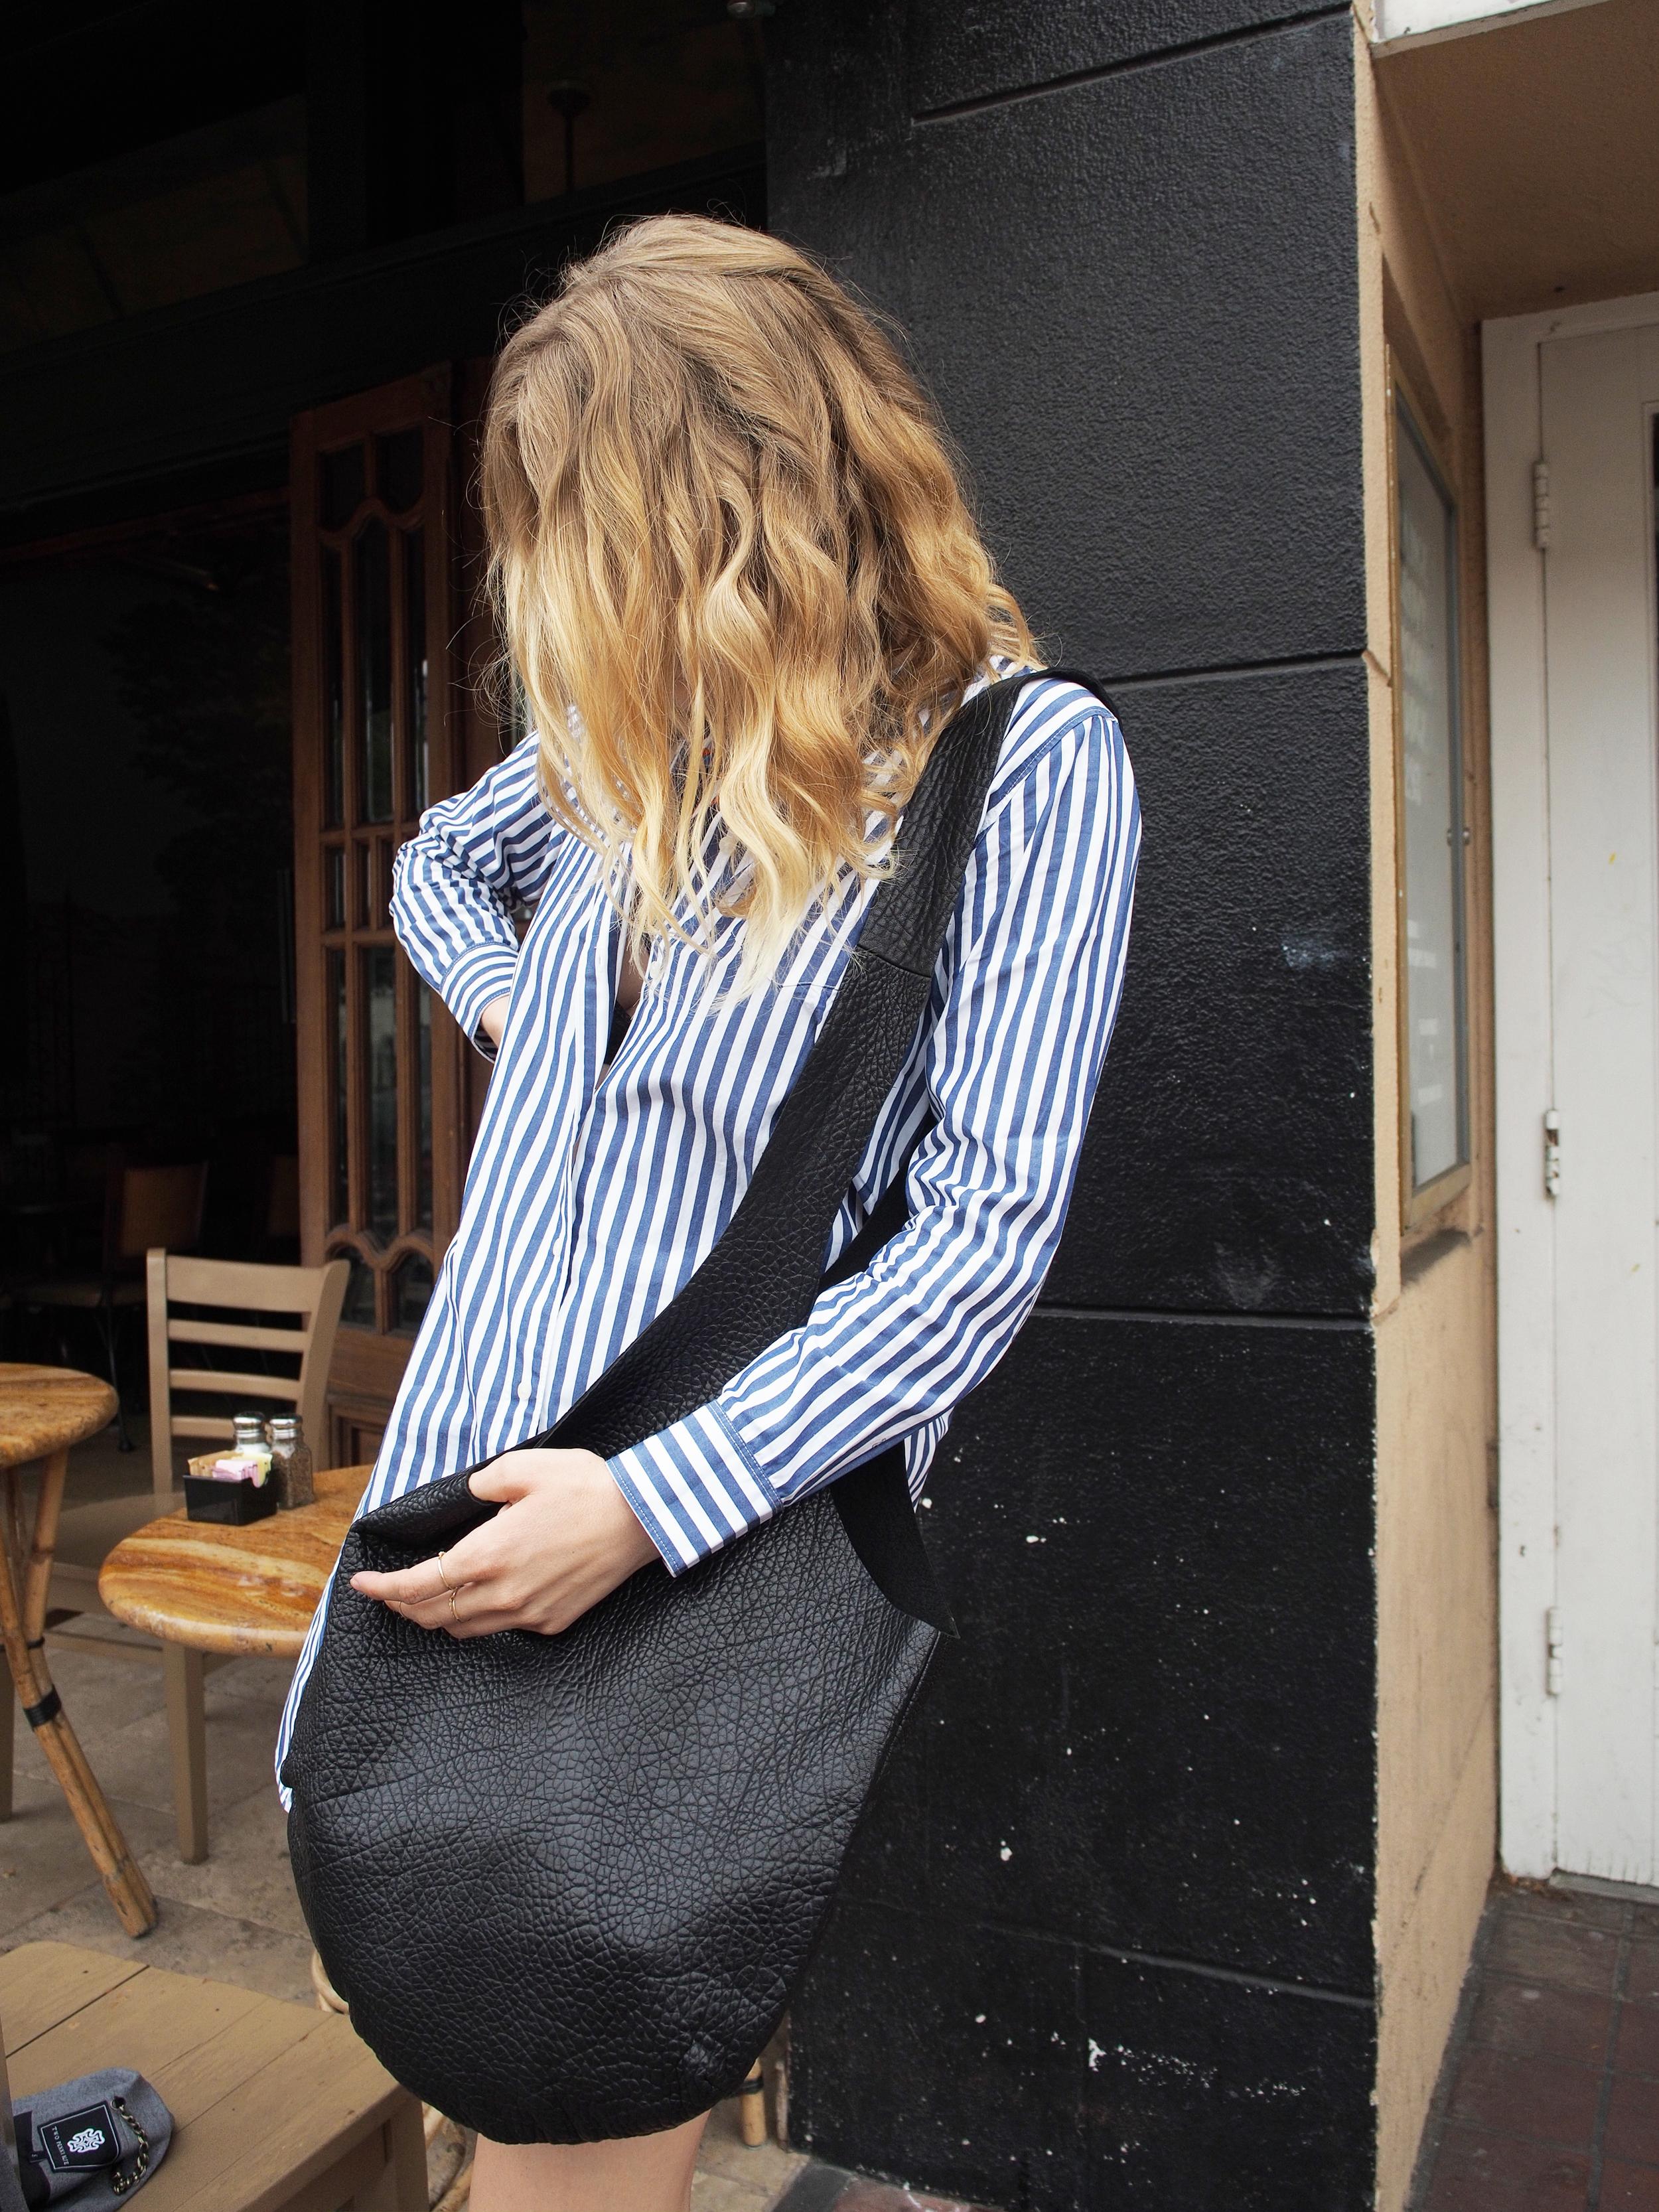 Everlane Striped Poplin Shirt Dress Two Penny Blue Vest MeChar Tote Madewell Sandals Coffee Street Style Look x Taylr Anne